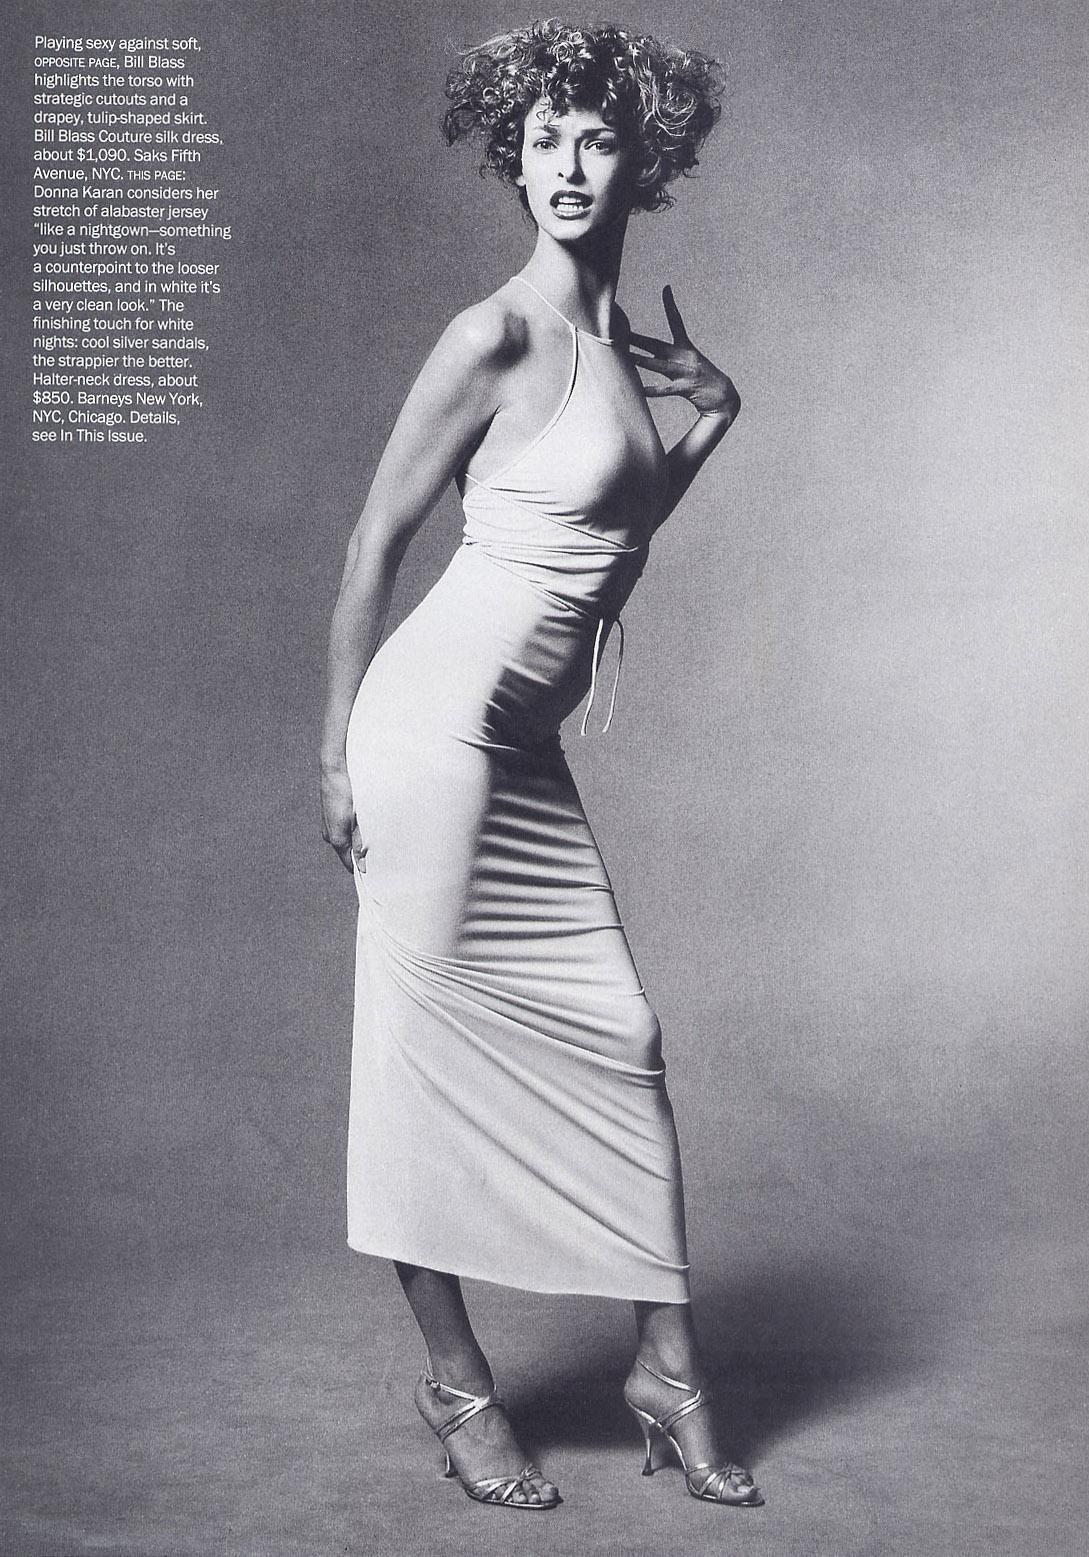 http://2.bp.blogspot.com/-807NDo7fGBo/T0TfAzgM0hI/AAAAAAAAATM/vUIgYtpnKxc/s1600/Linda+Evangelista+1994+02+Vogue+Us+Ph+Steven+Meisel+04.jpg